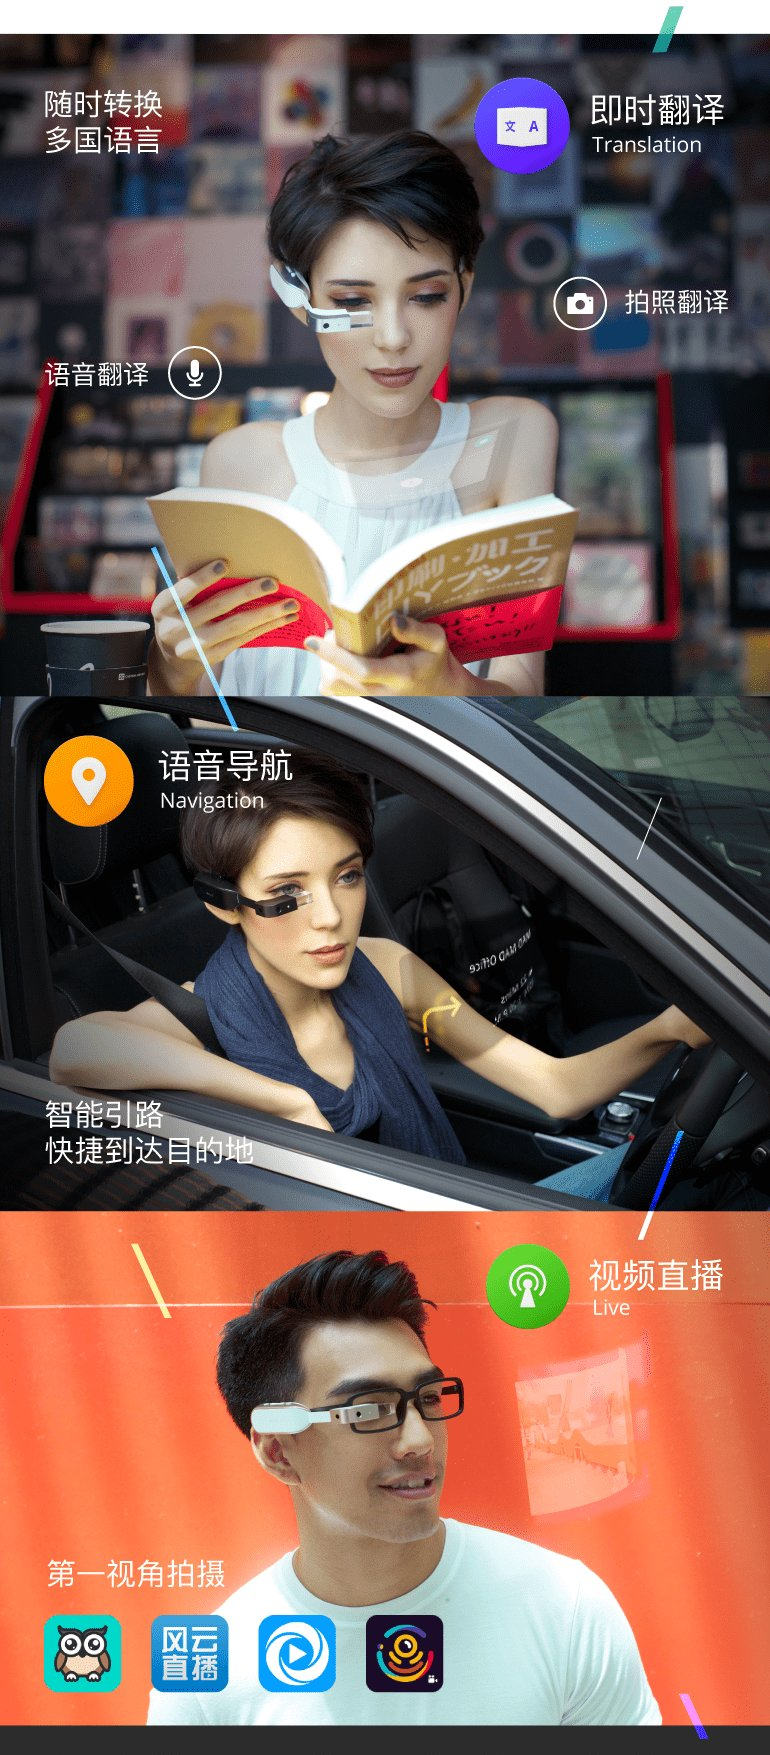 MADGazeAR智能眼镜:MADGaze AR眼镜怎么样?MADGazeAR智能眼镜迎接AR大势!